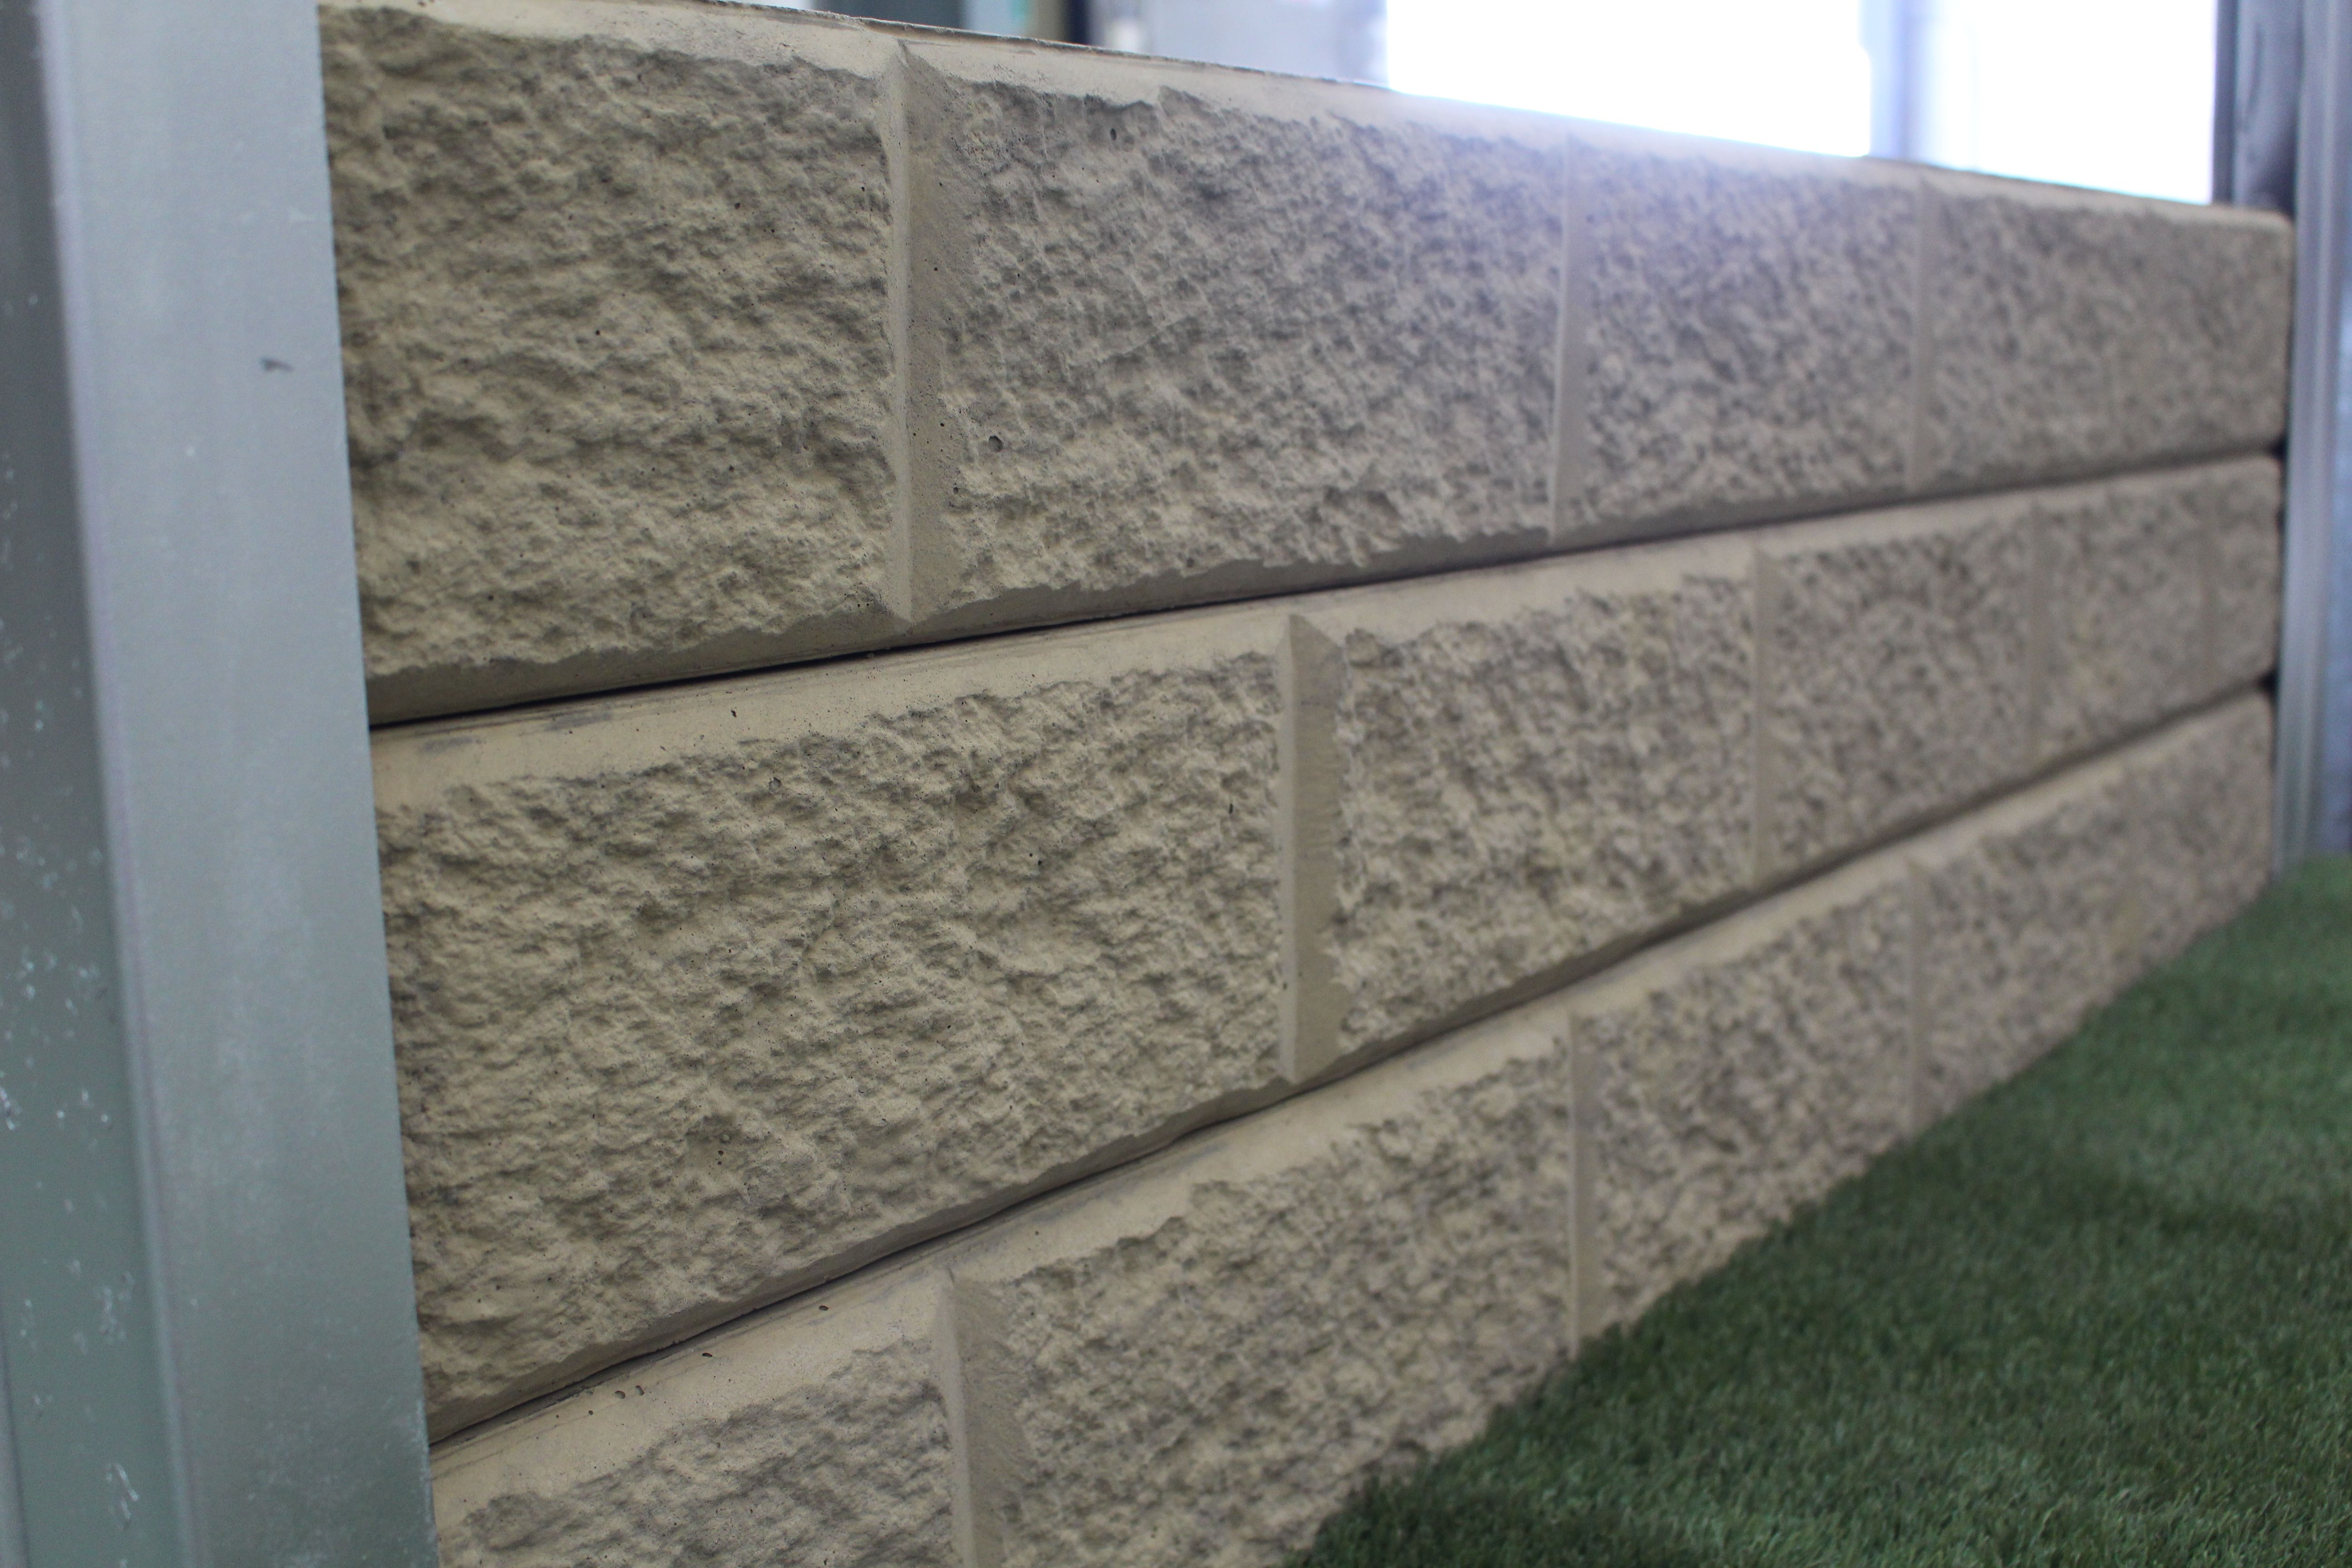 Ridgi Sandstone Effect Sample Concrete Sleeper Retaining Wall By Aussie Concrete Products Concrete Sleeper Retaining Walls Concrete Sleepers Building Hardware